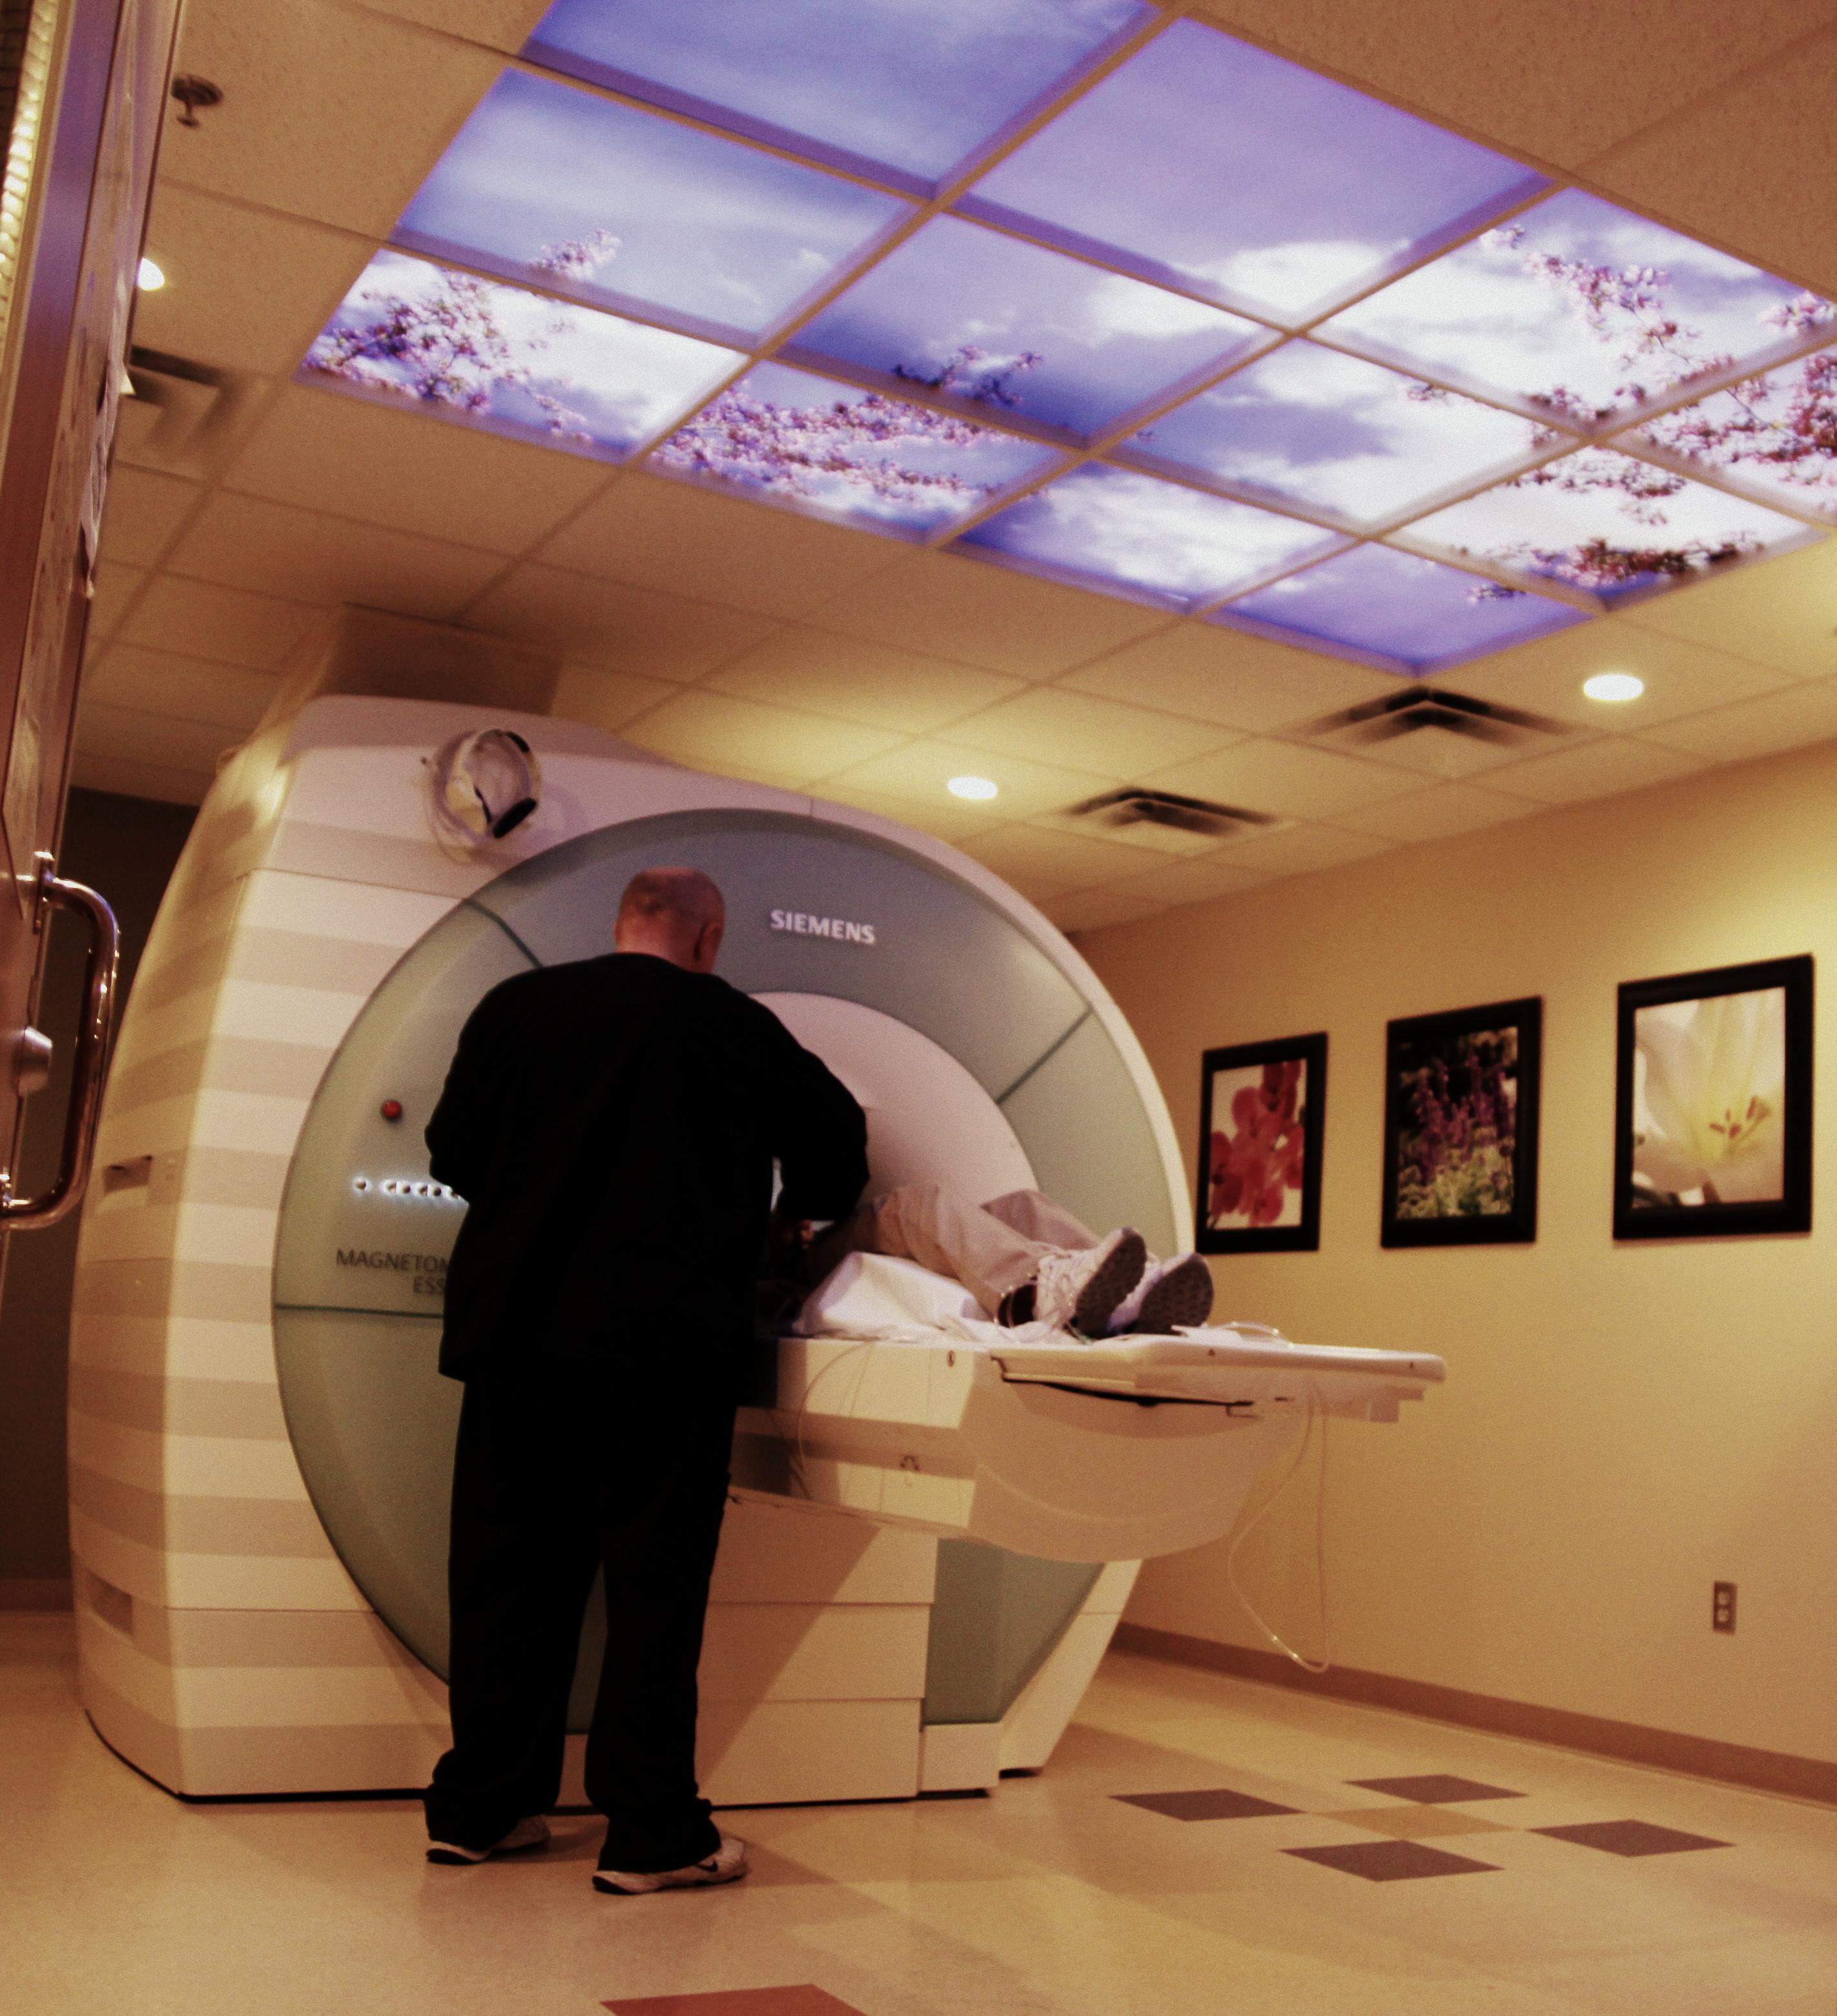 Paris Community Hospital image 1